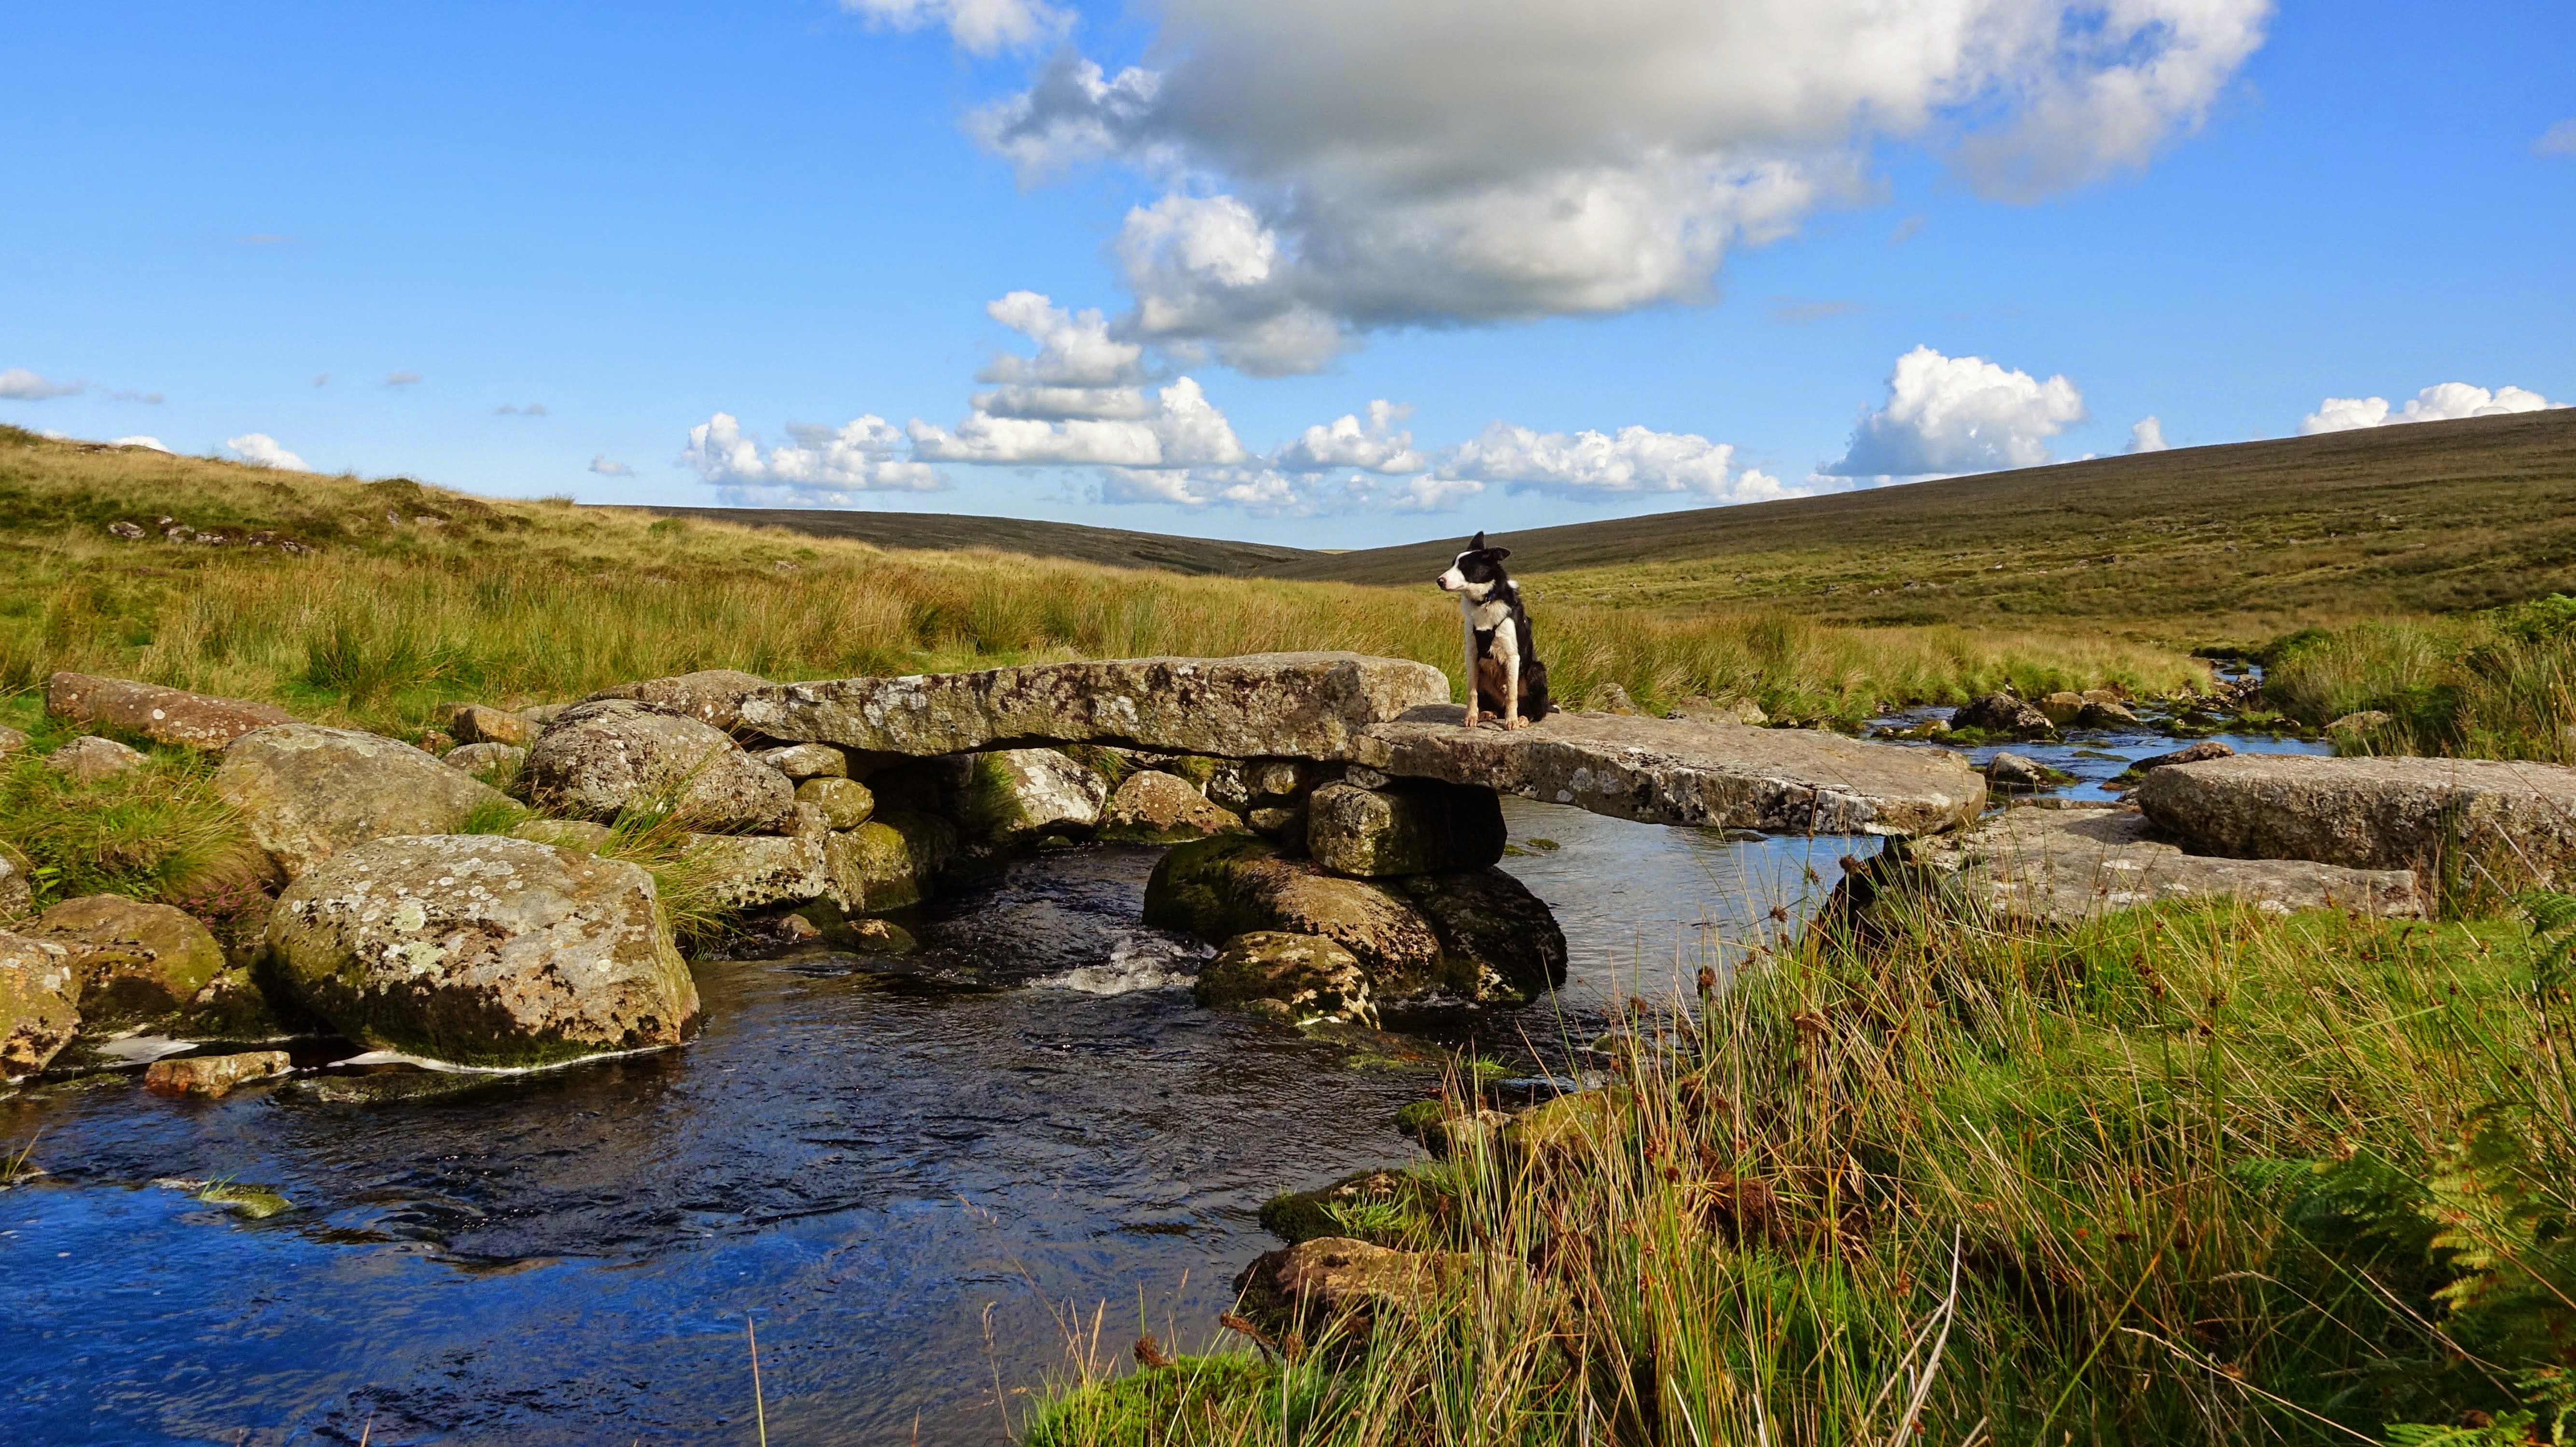 A Trip To Dartmoor